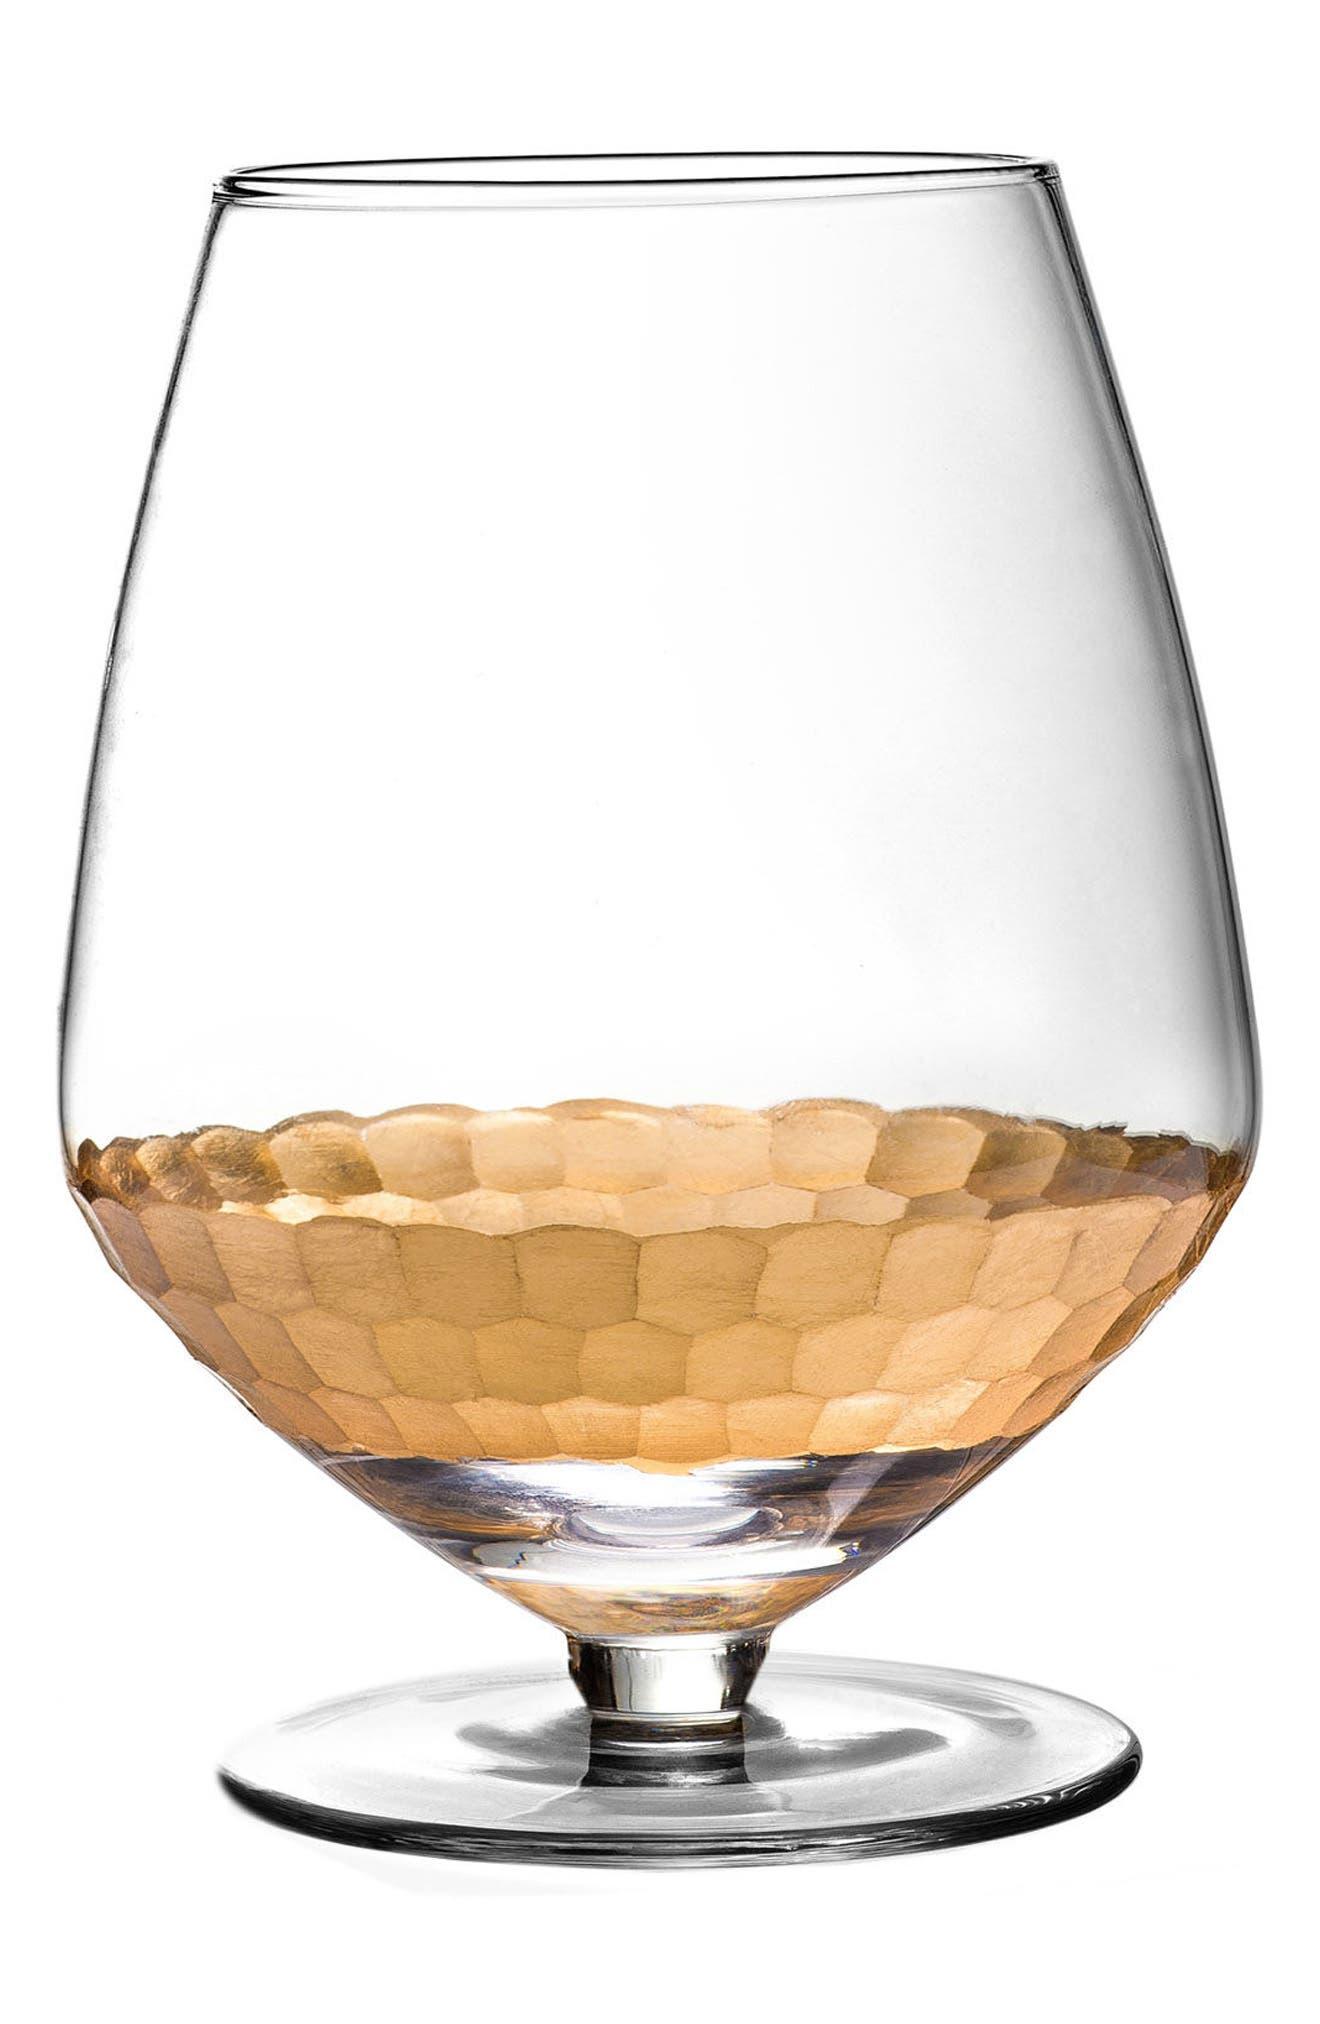 Daphne Set of 4 Pinot Noir Glasses,                             Main thumbnail 1, color,                             710